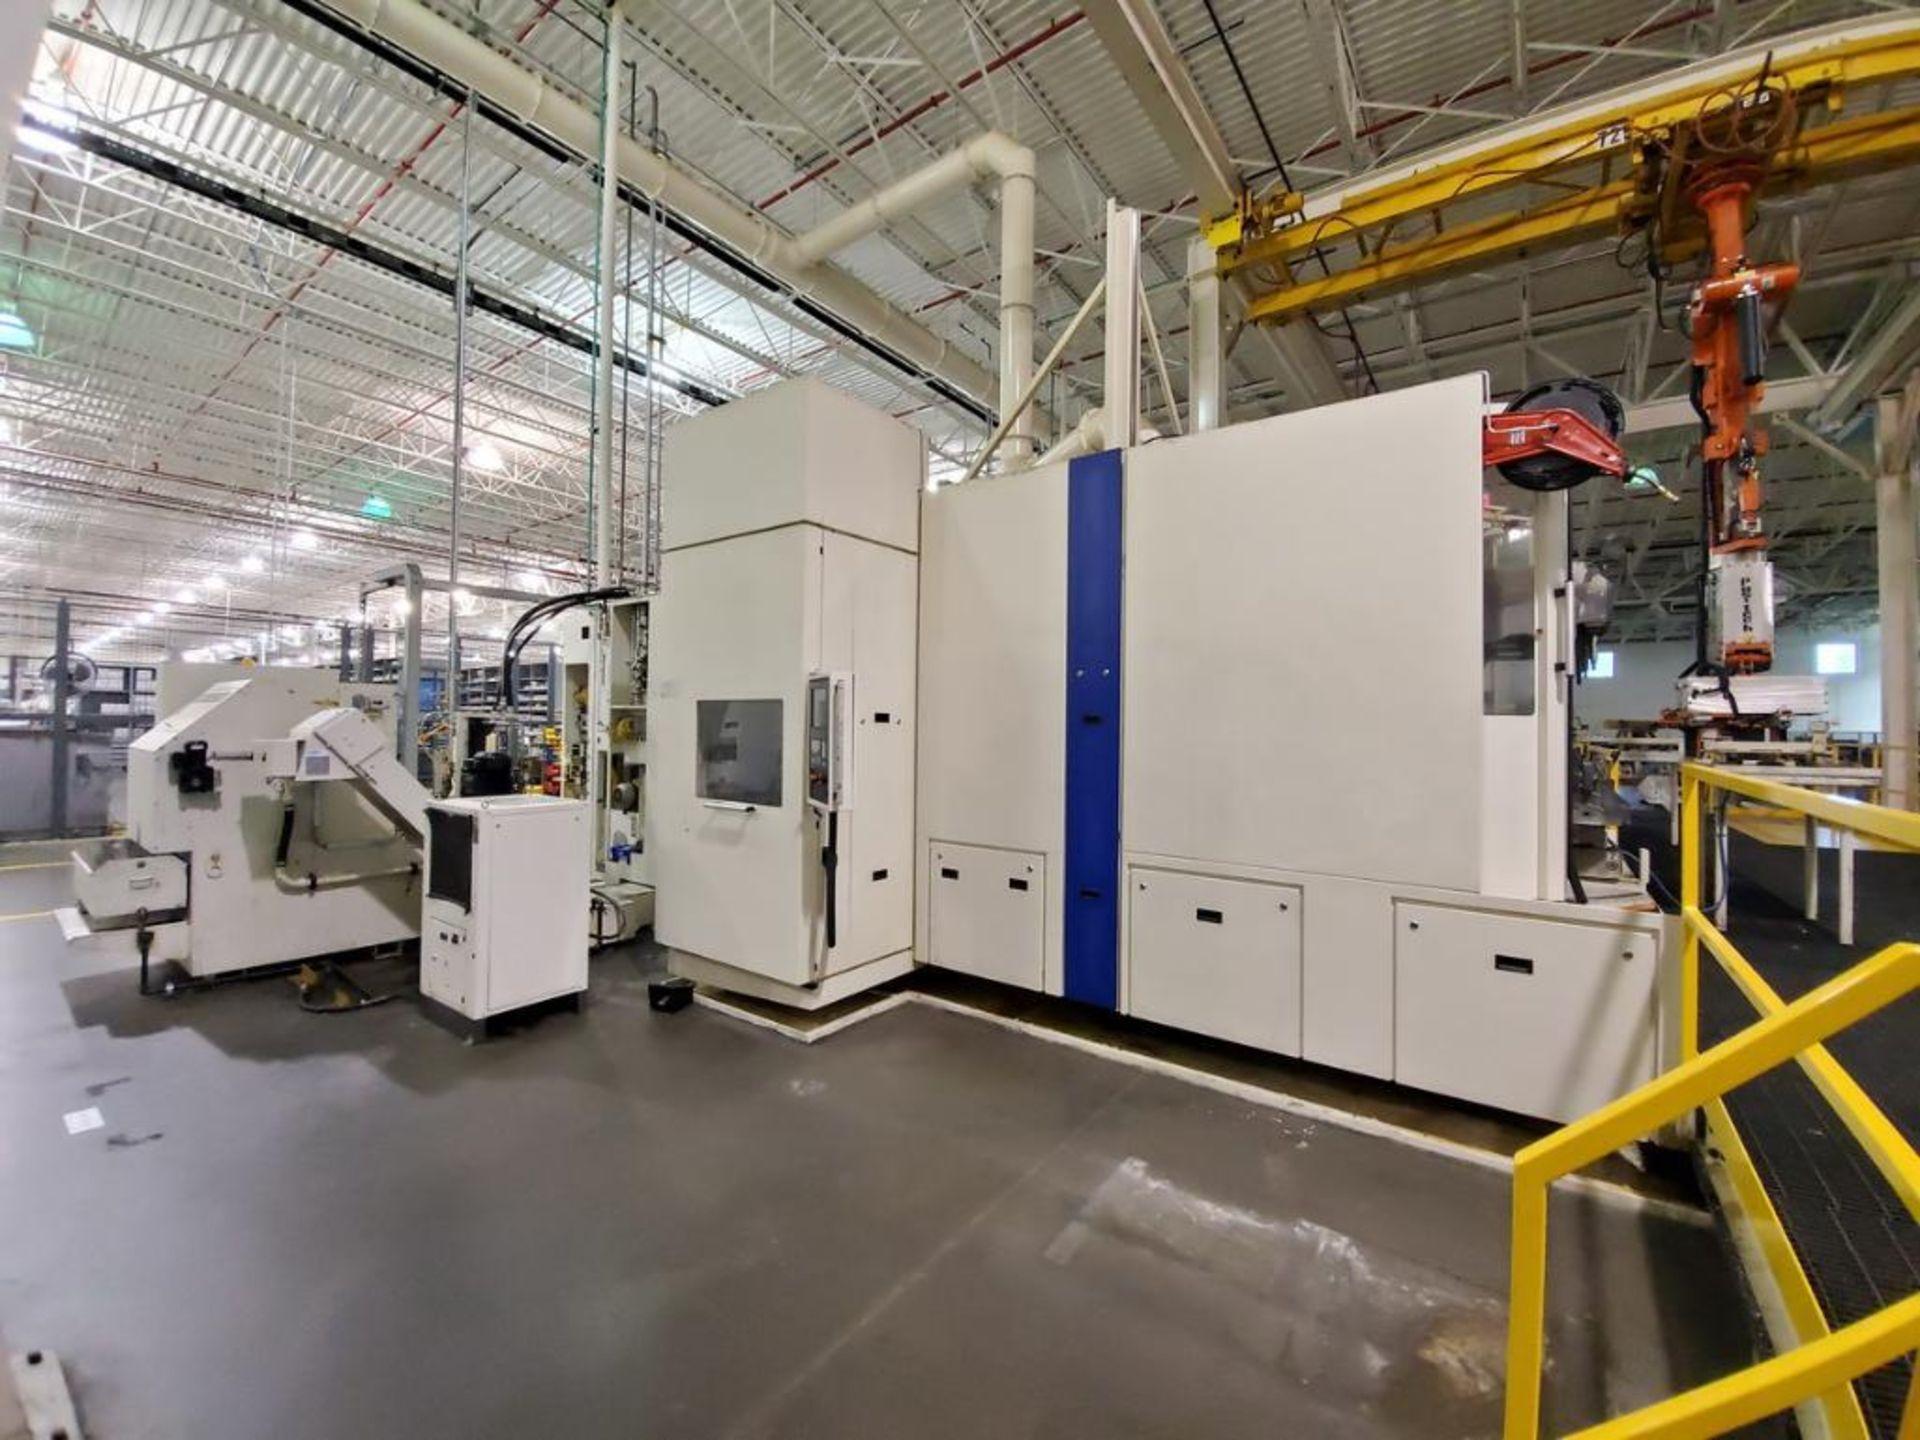 Lot 3 - 2011 Heller MCH 400 PC, Horizontal Machining Center